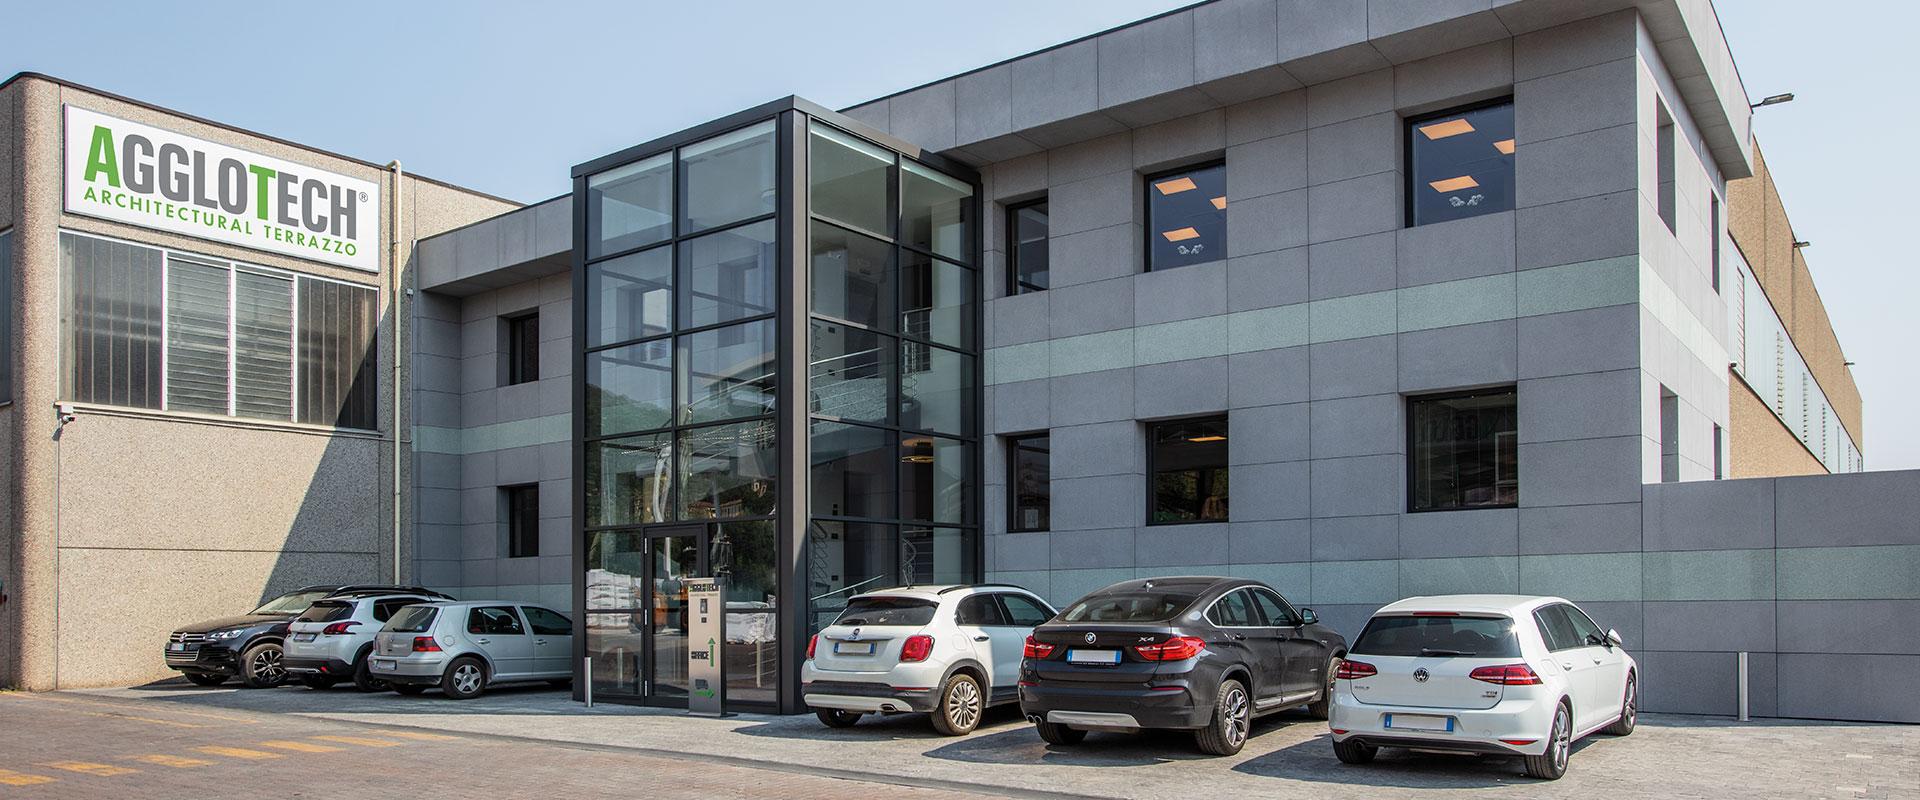 agglotech-offices-verona-italy-custom-REG-3594-centri-direzionali-01